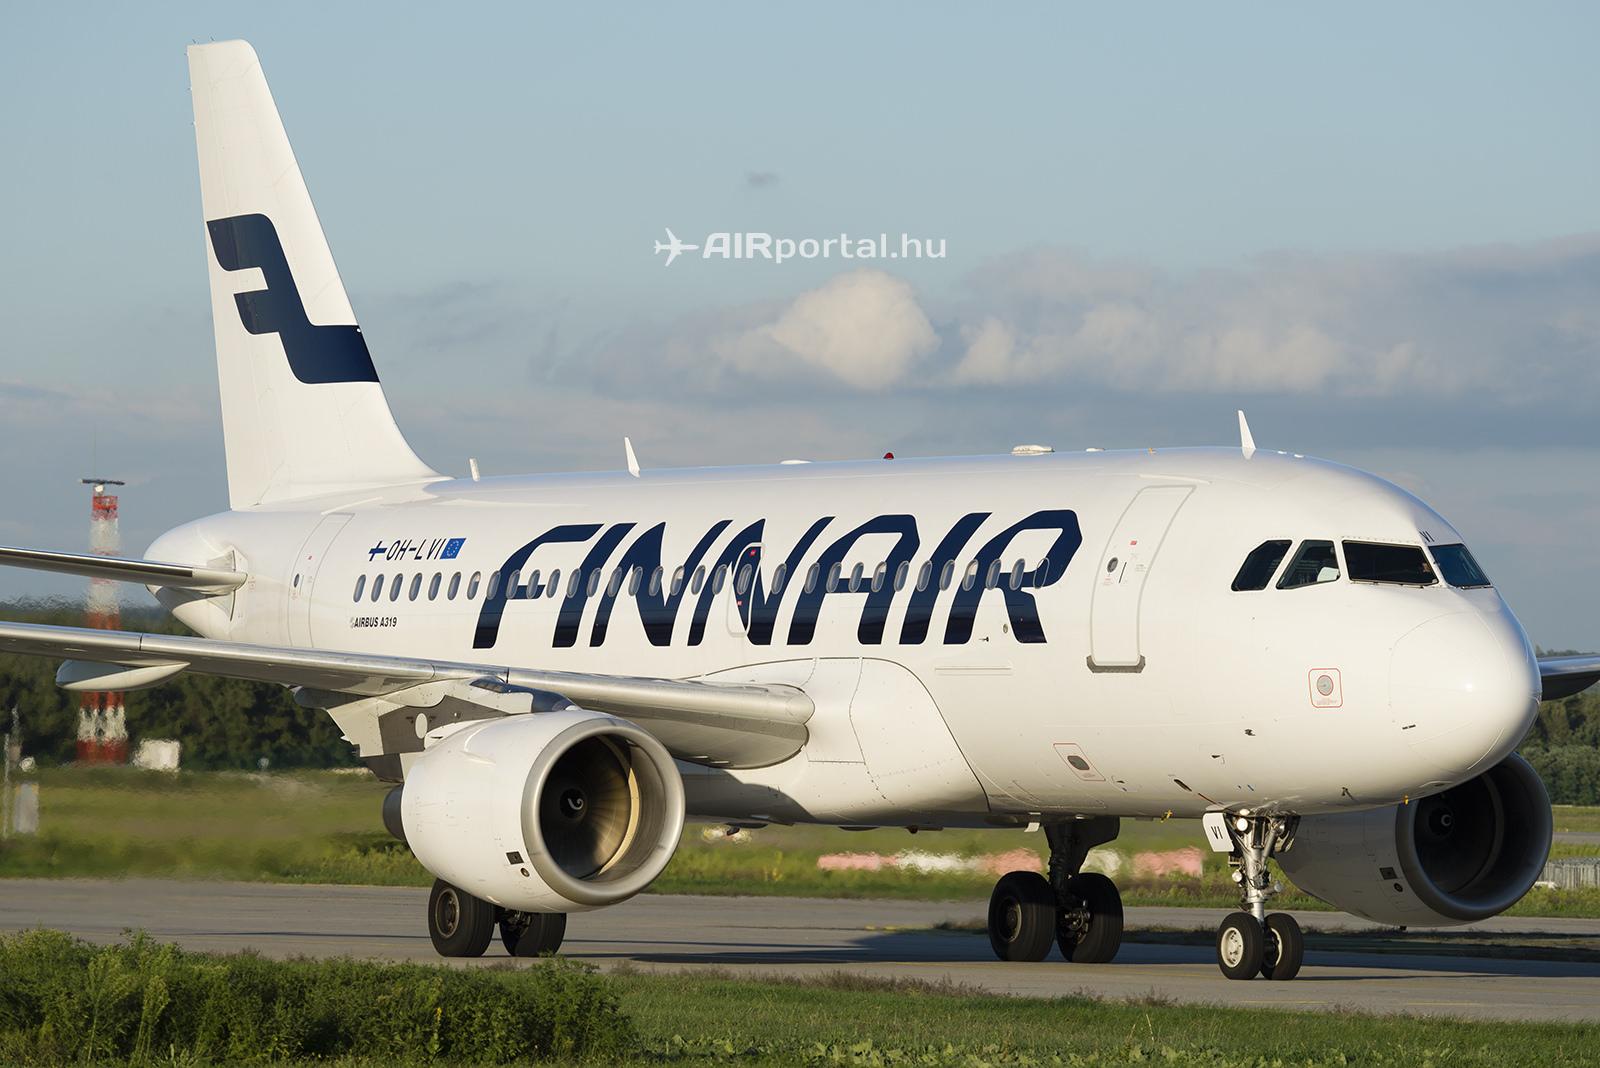 A Finnair Airbus A319-es repülőgépe.(Fotó: Bodorics Tamás - AIRportal.hu) | © AIRportal.hu